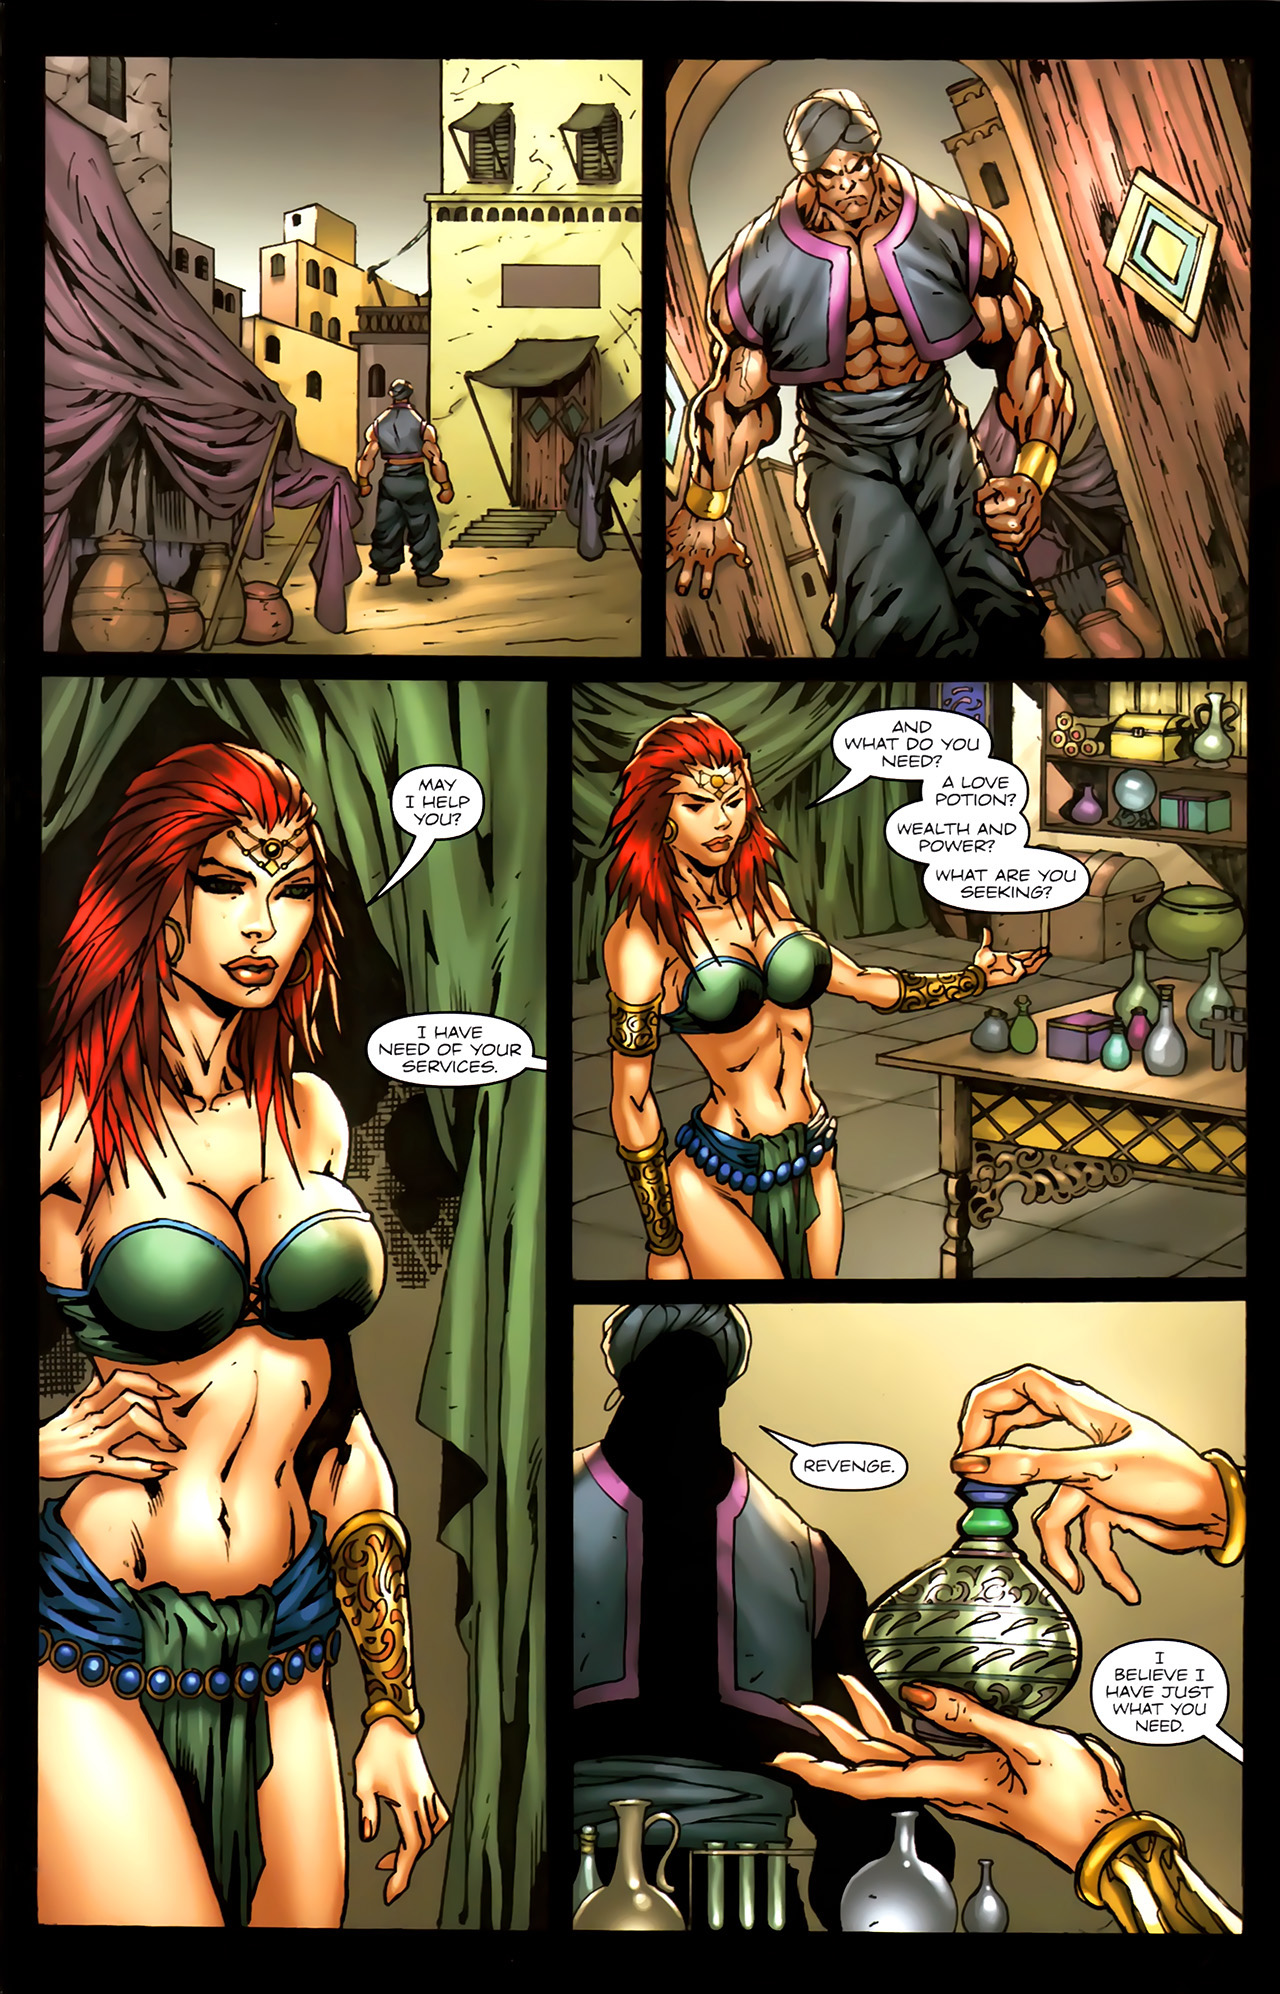 Read online 1001 Arabian Nights: The Adventures of Sinbad comic -  Issue #7 - 18